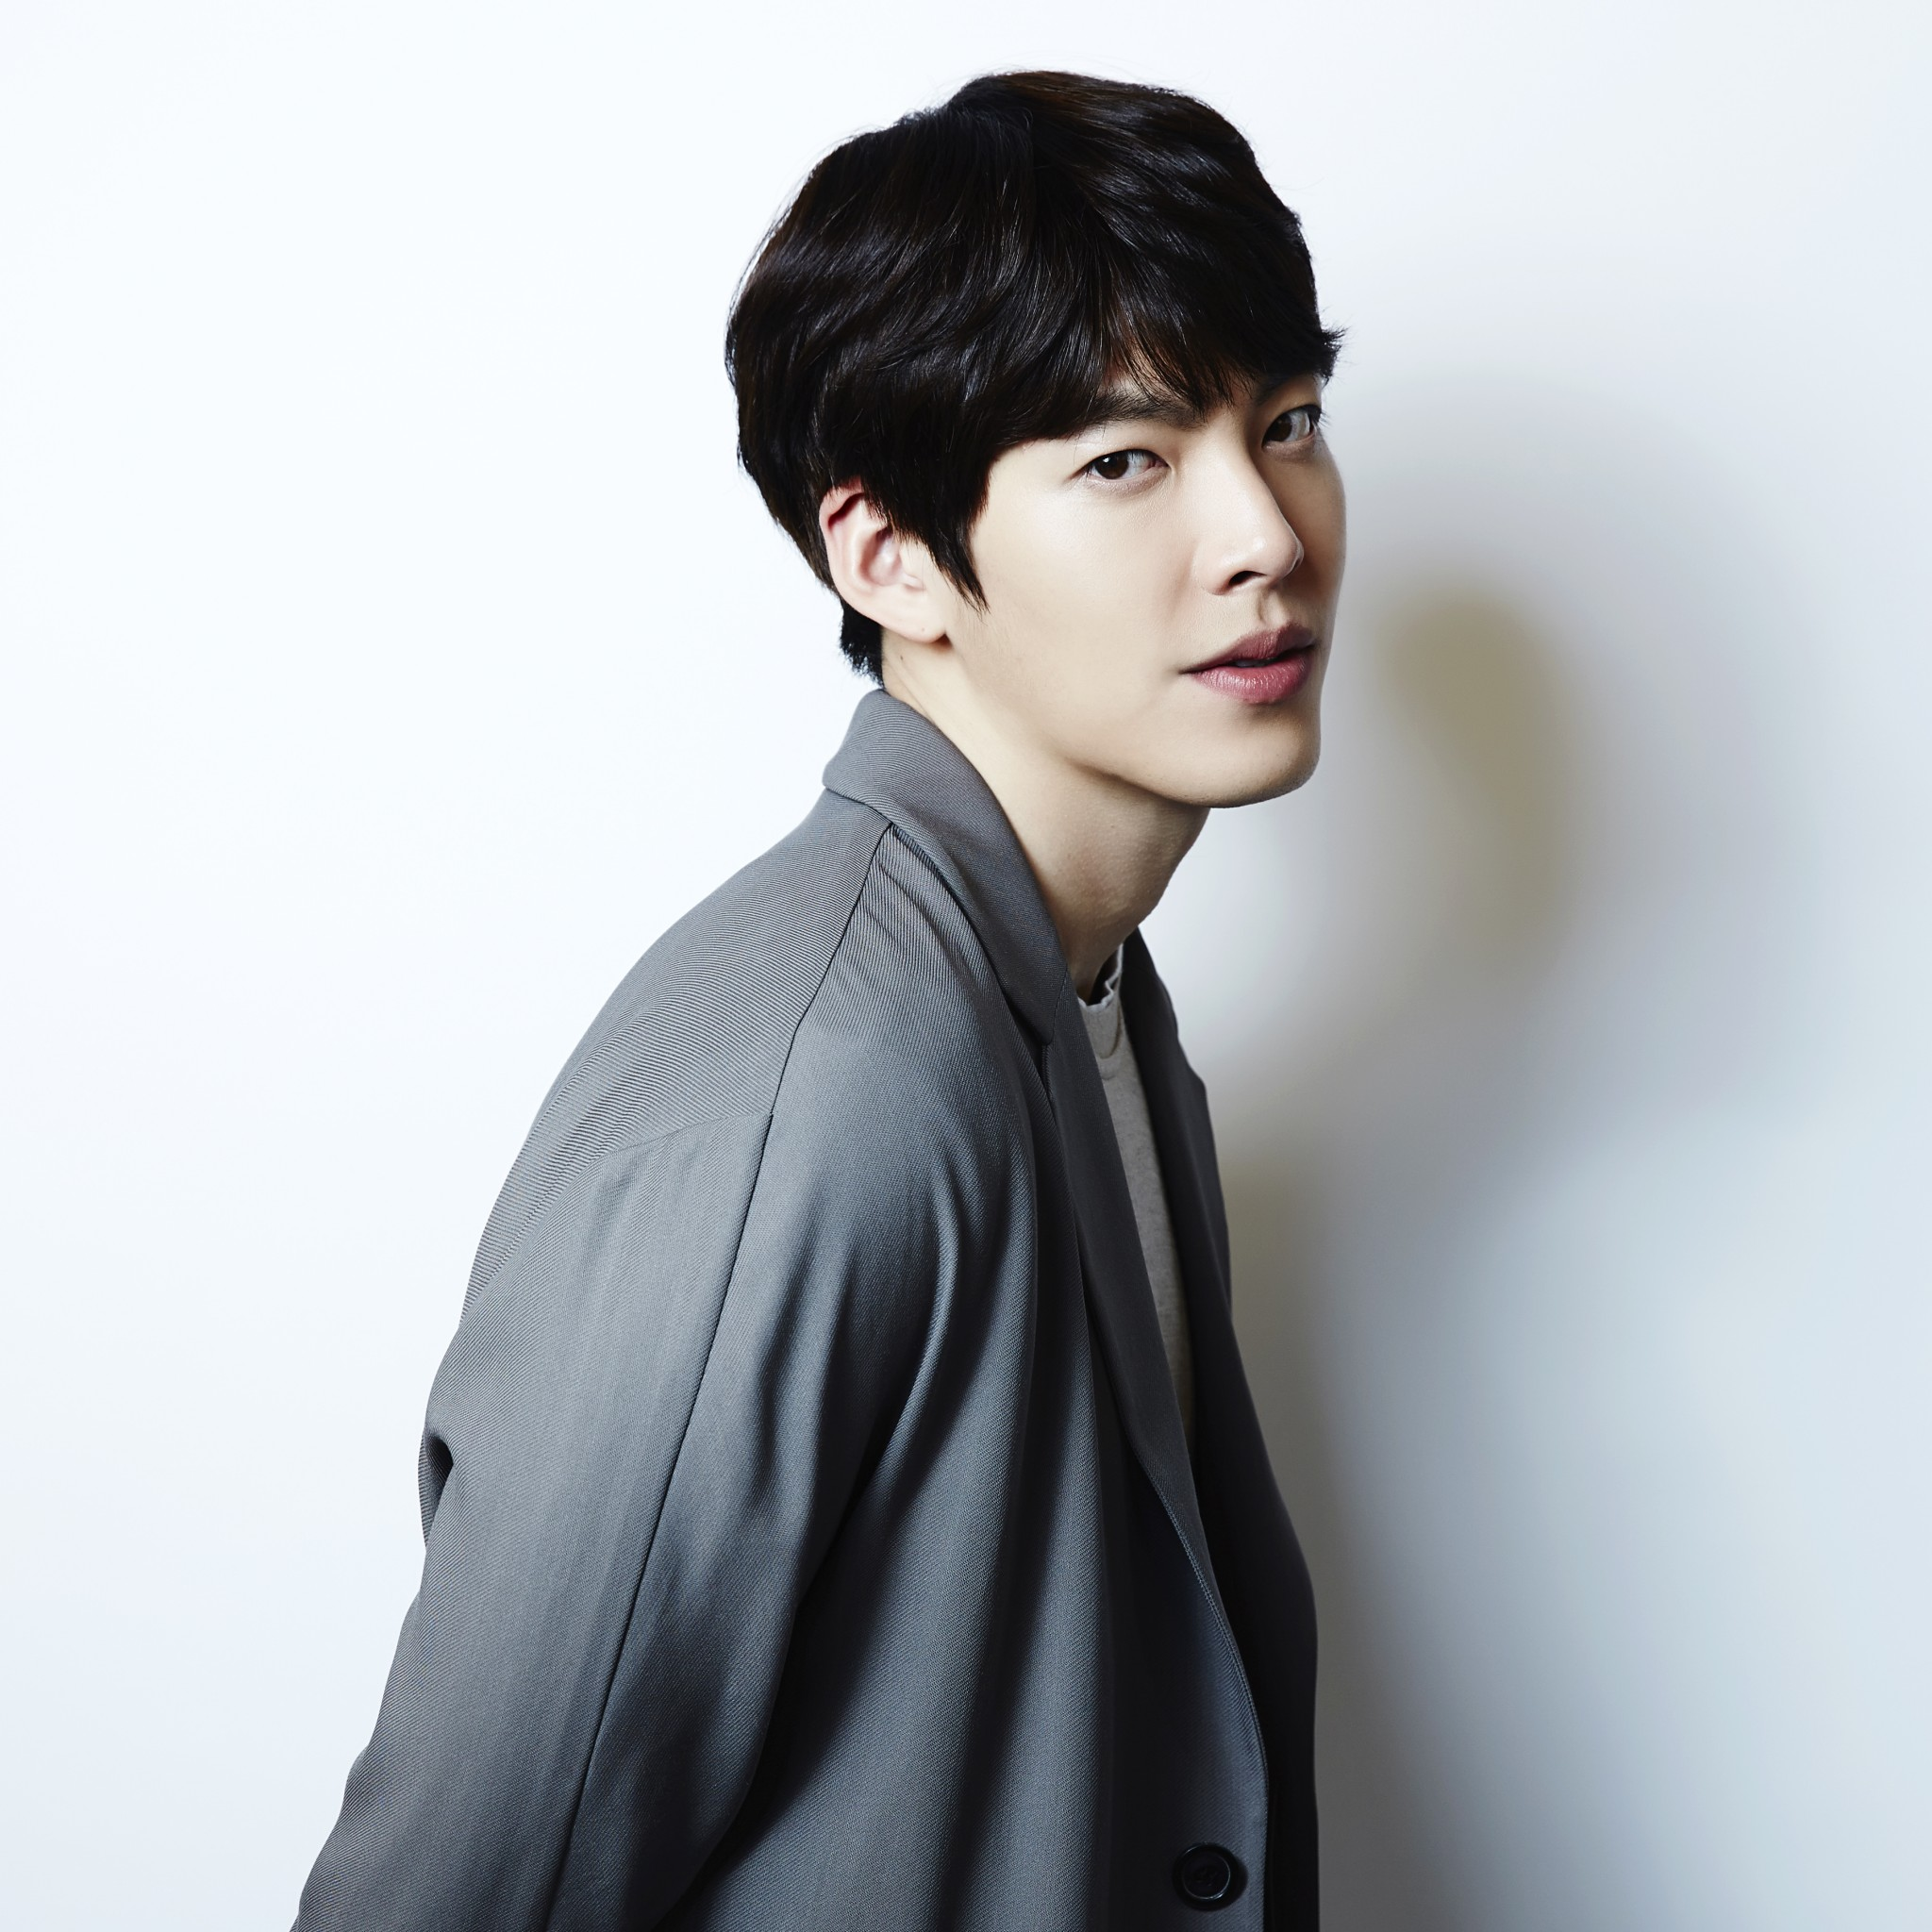 Download Kim Woo Bin 2048 x 2048 Wallpapers   4681653 2048x2048